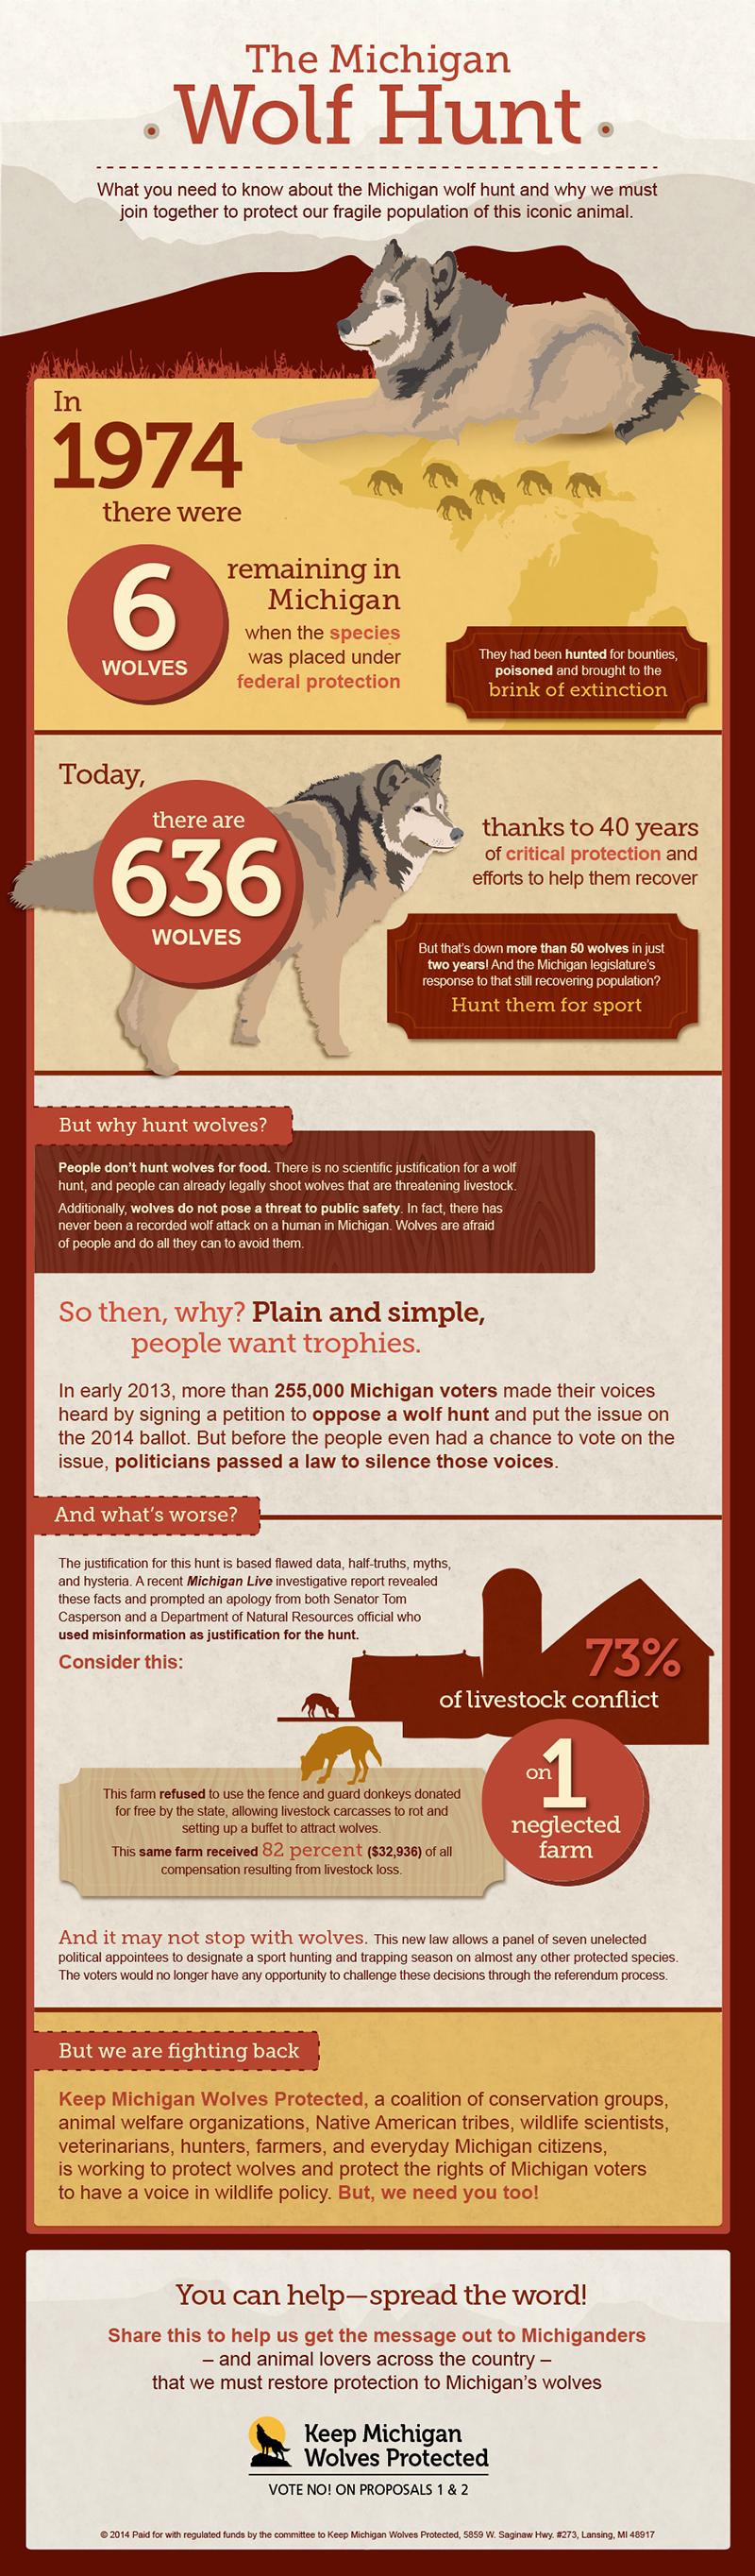 kmwp_infographic_2014